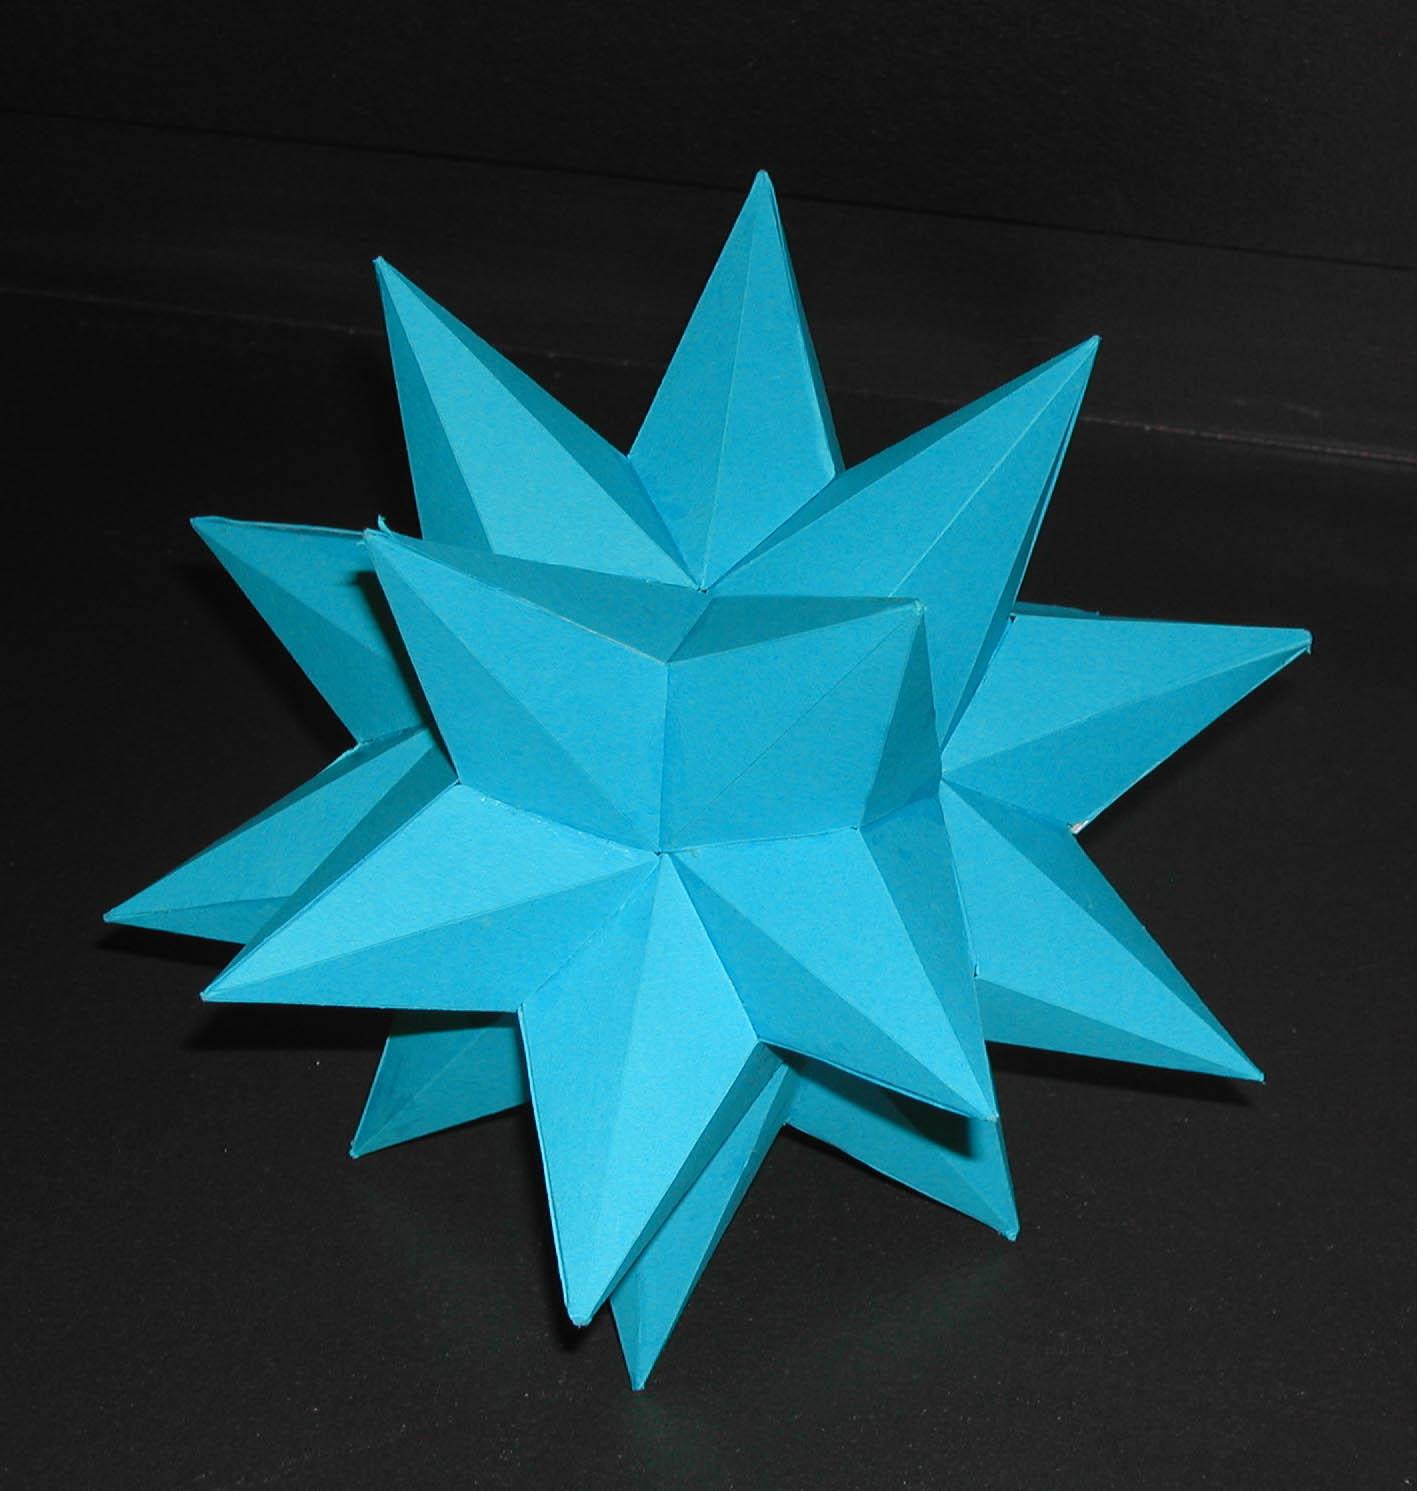 Linkpage Specials Raumgeometrie-Labor von Rolf Wirz